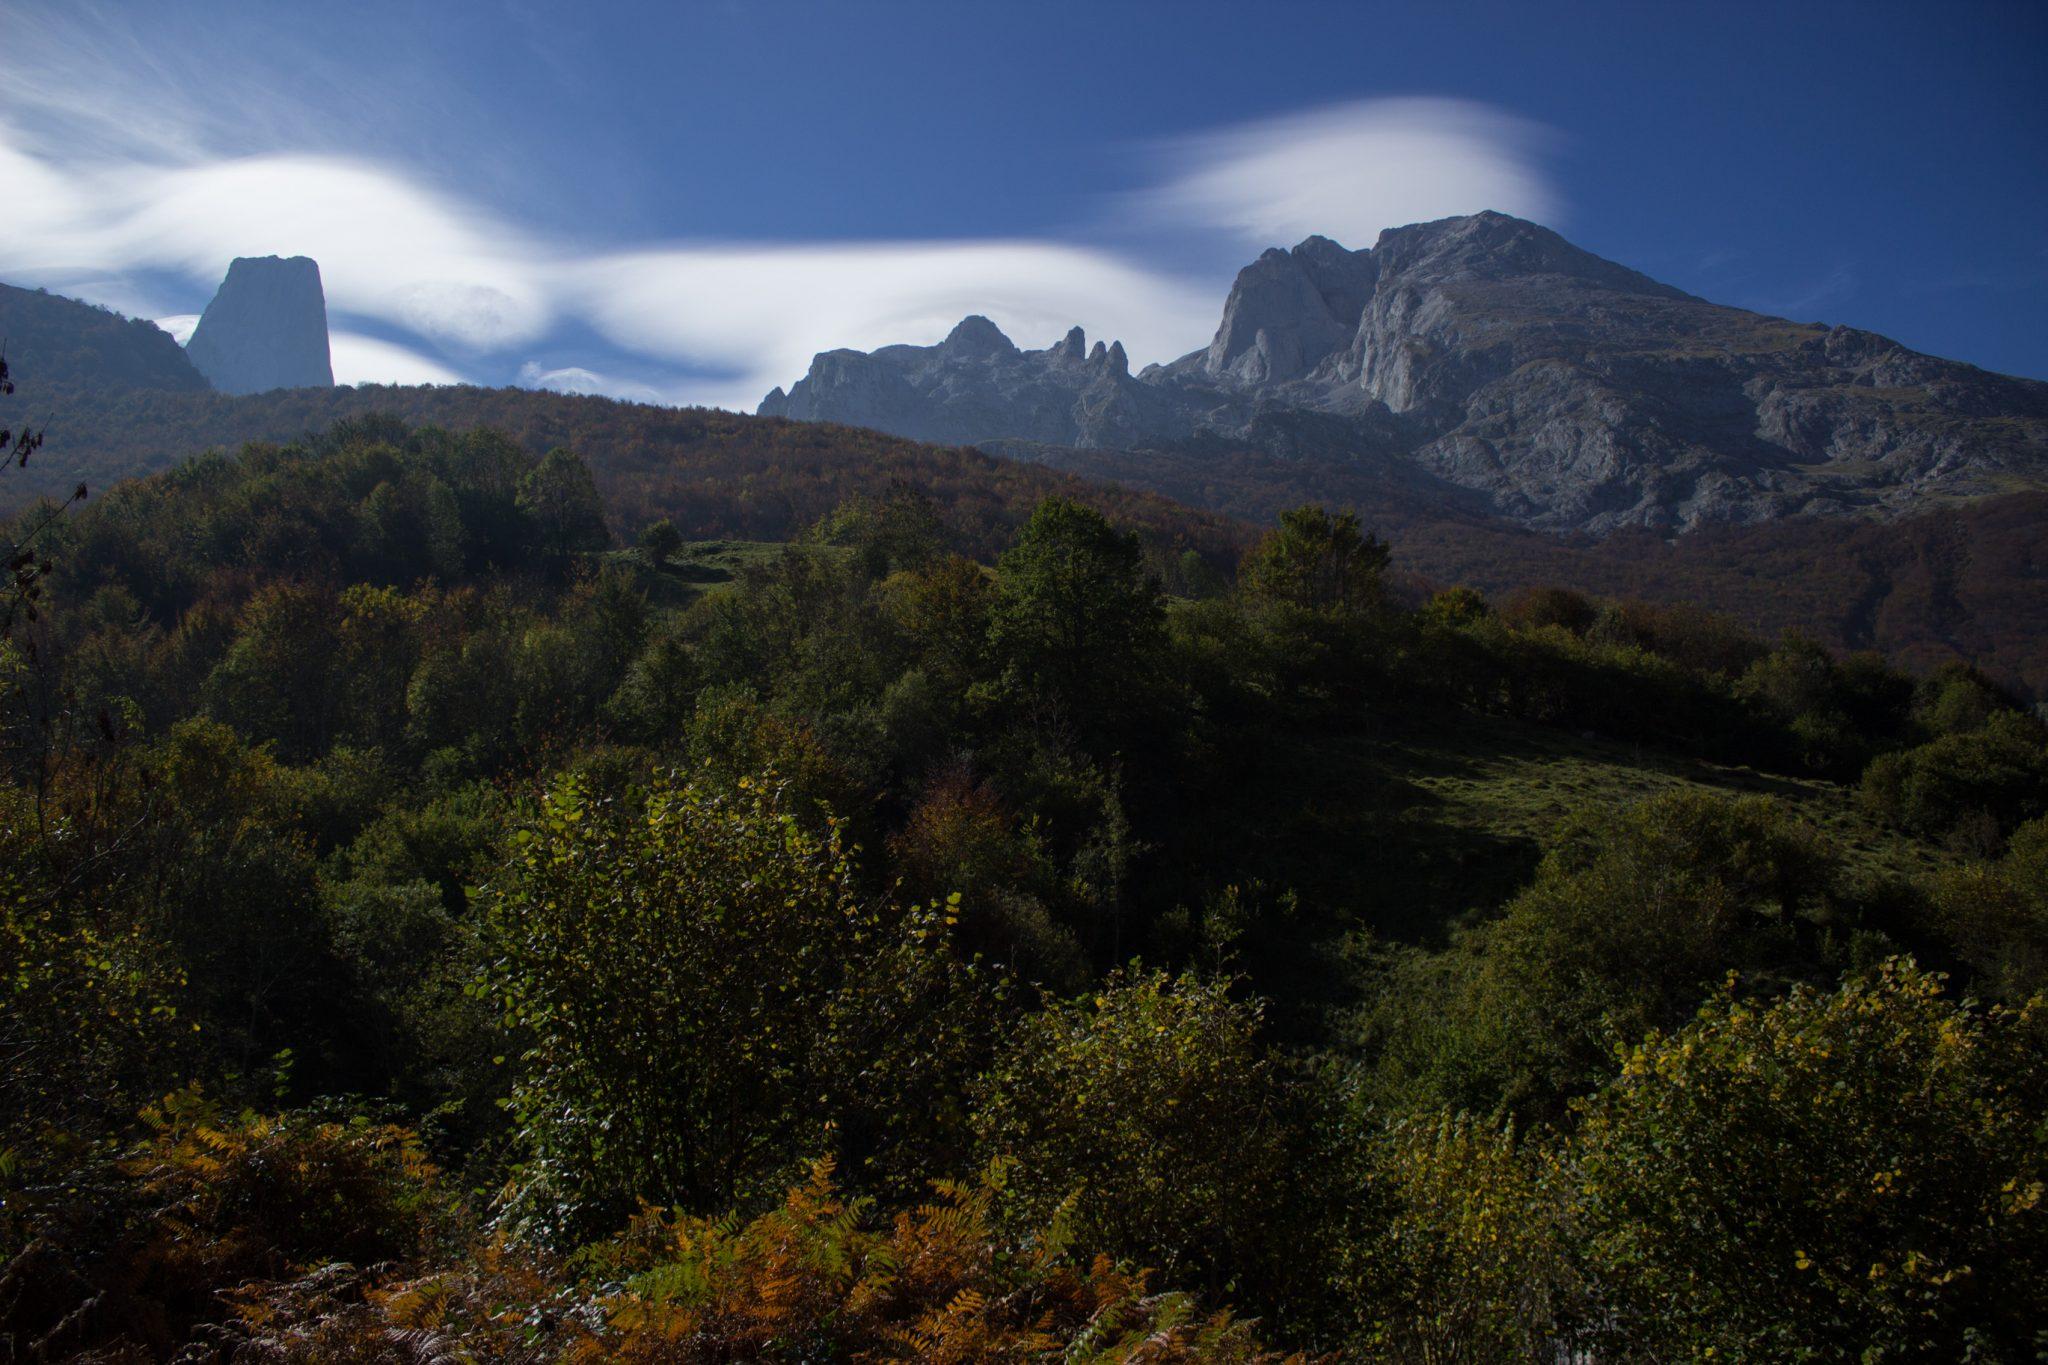 Wanderung Poncebos nach Bulnes in den Picos de Europa, Ausblick auf Berg Naranjo de Bulnes, auch Picu Urriellu, bekanntester Berg in Picos de Europa